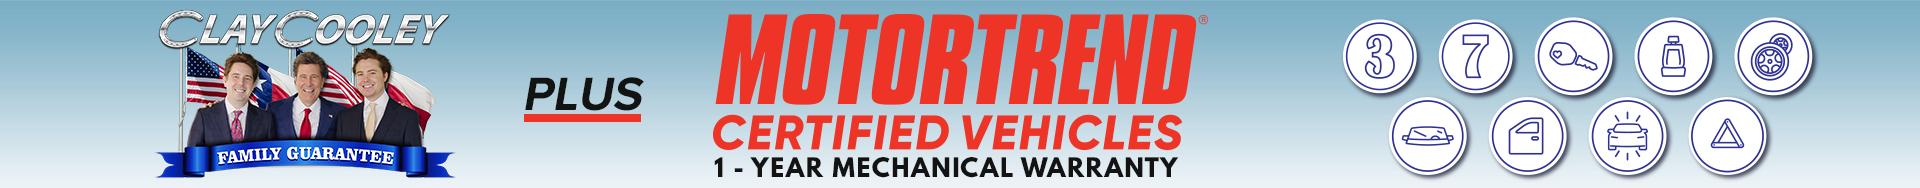 Updated Ccag Motortrend Vsr